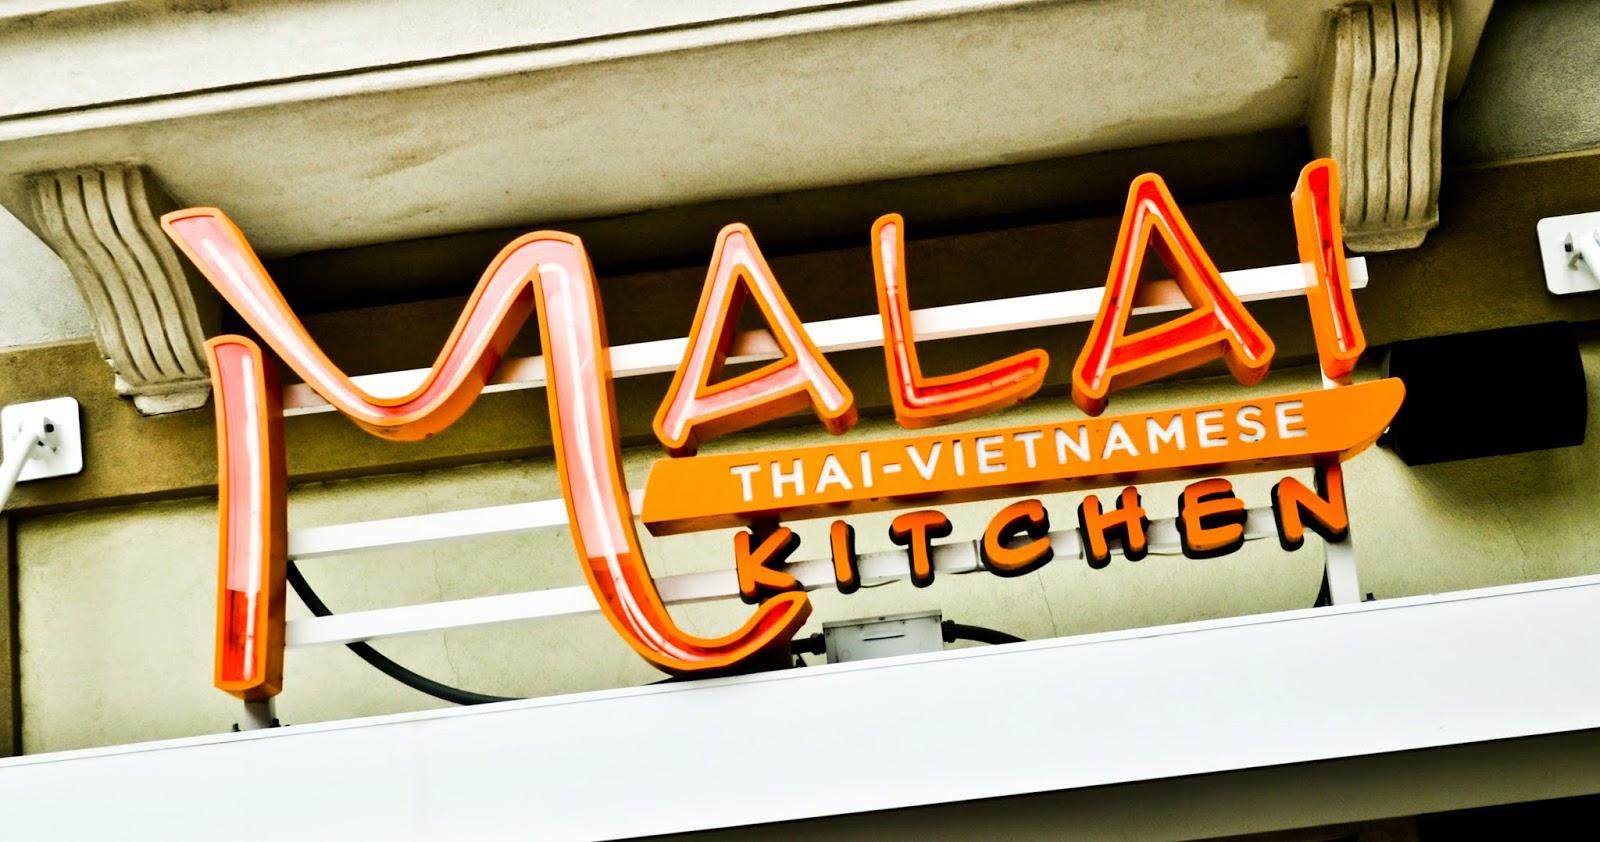 Malai Kitchen A Thai Vietnamese Brewpub